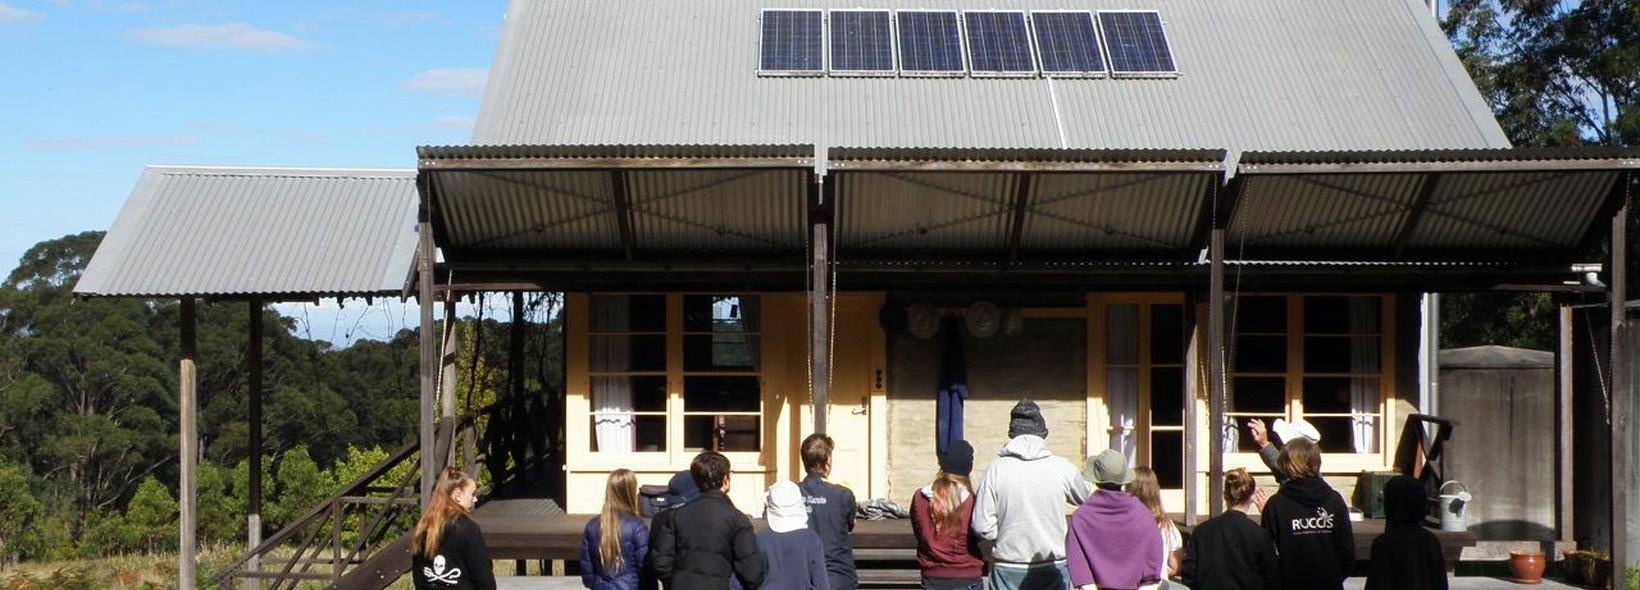 Visit to Callicoma Hill Eco-cabins